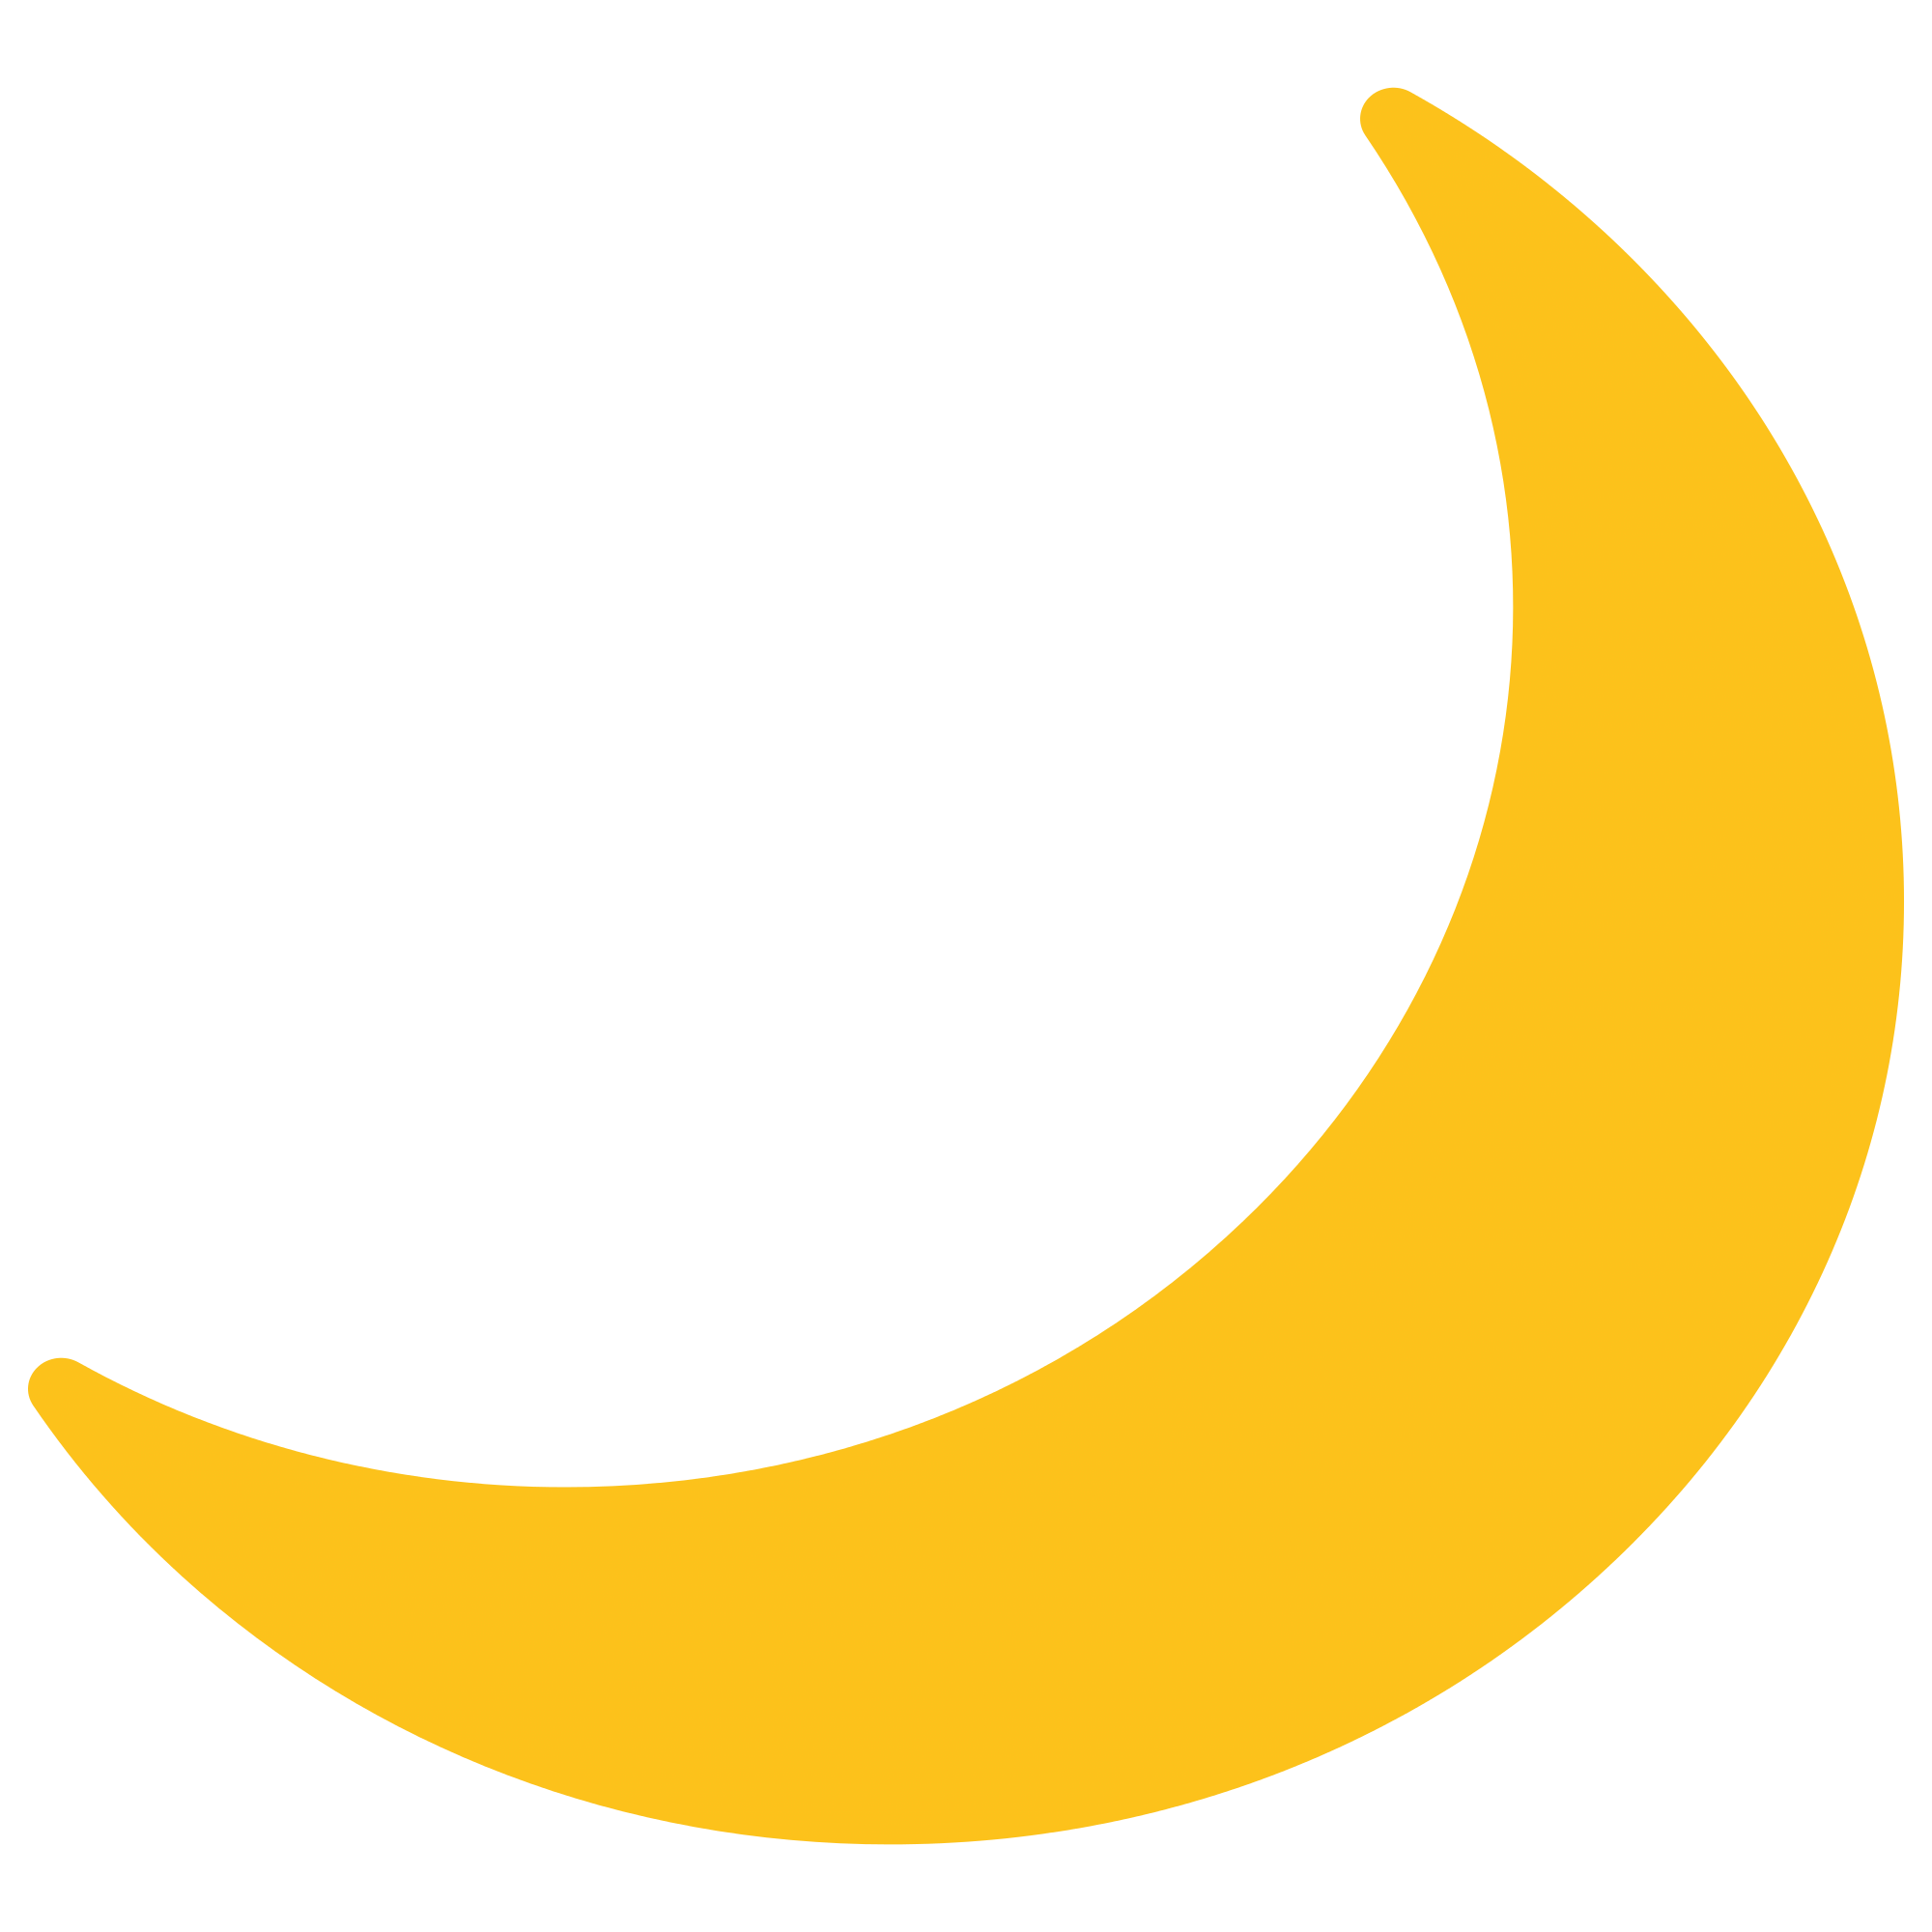 Emoji Moon transparent PNG.